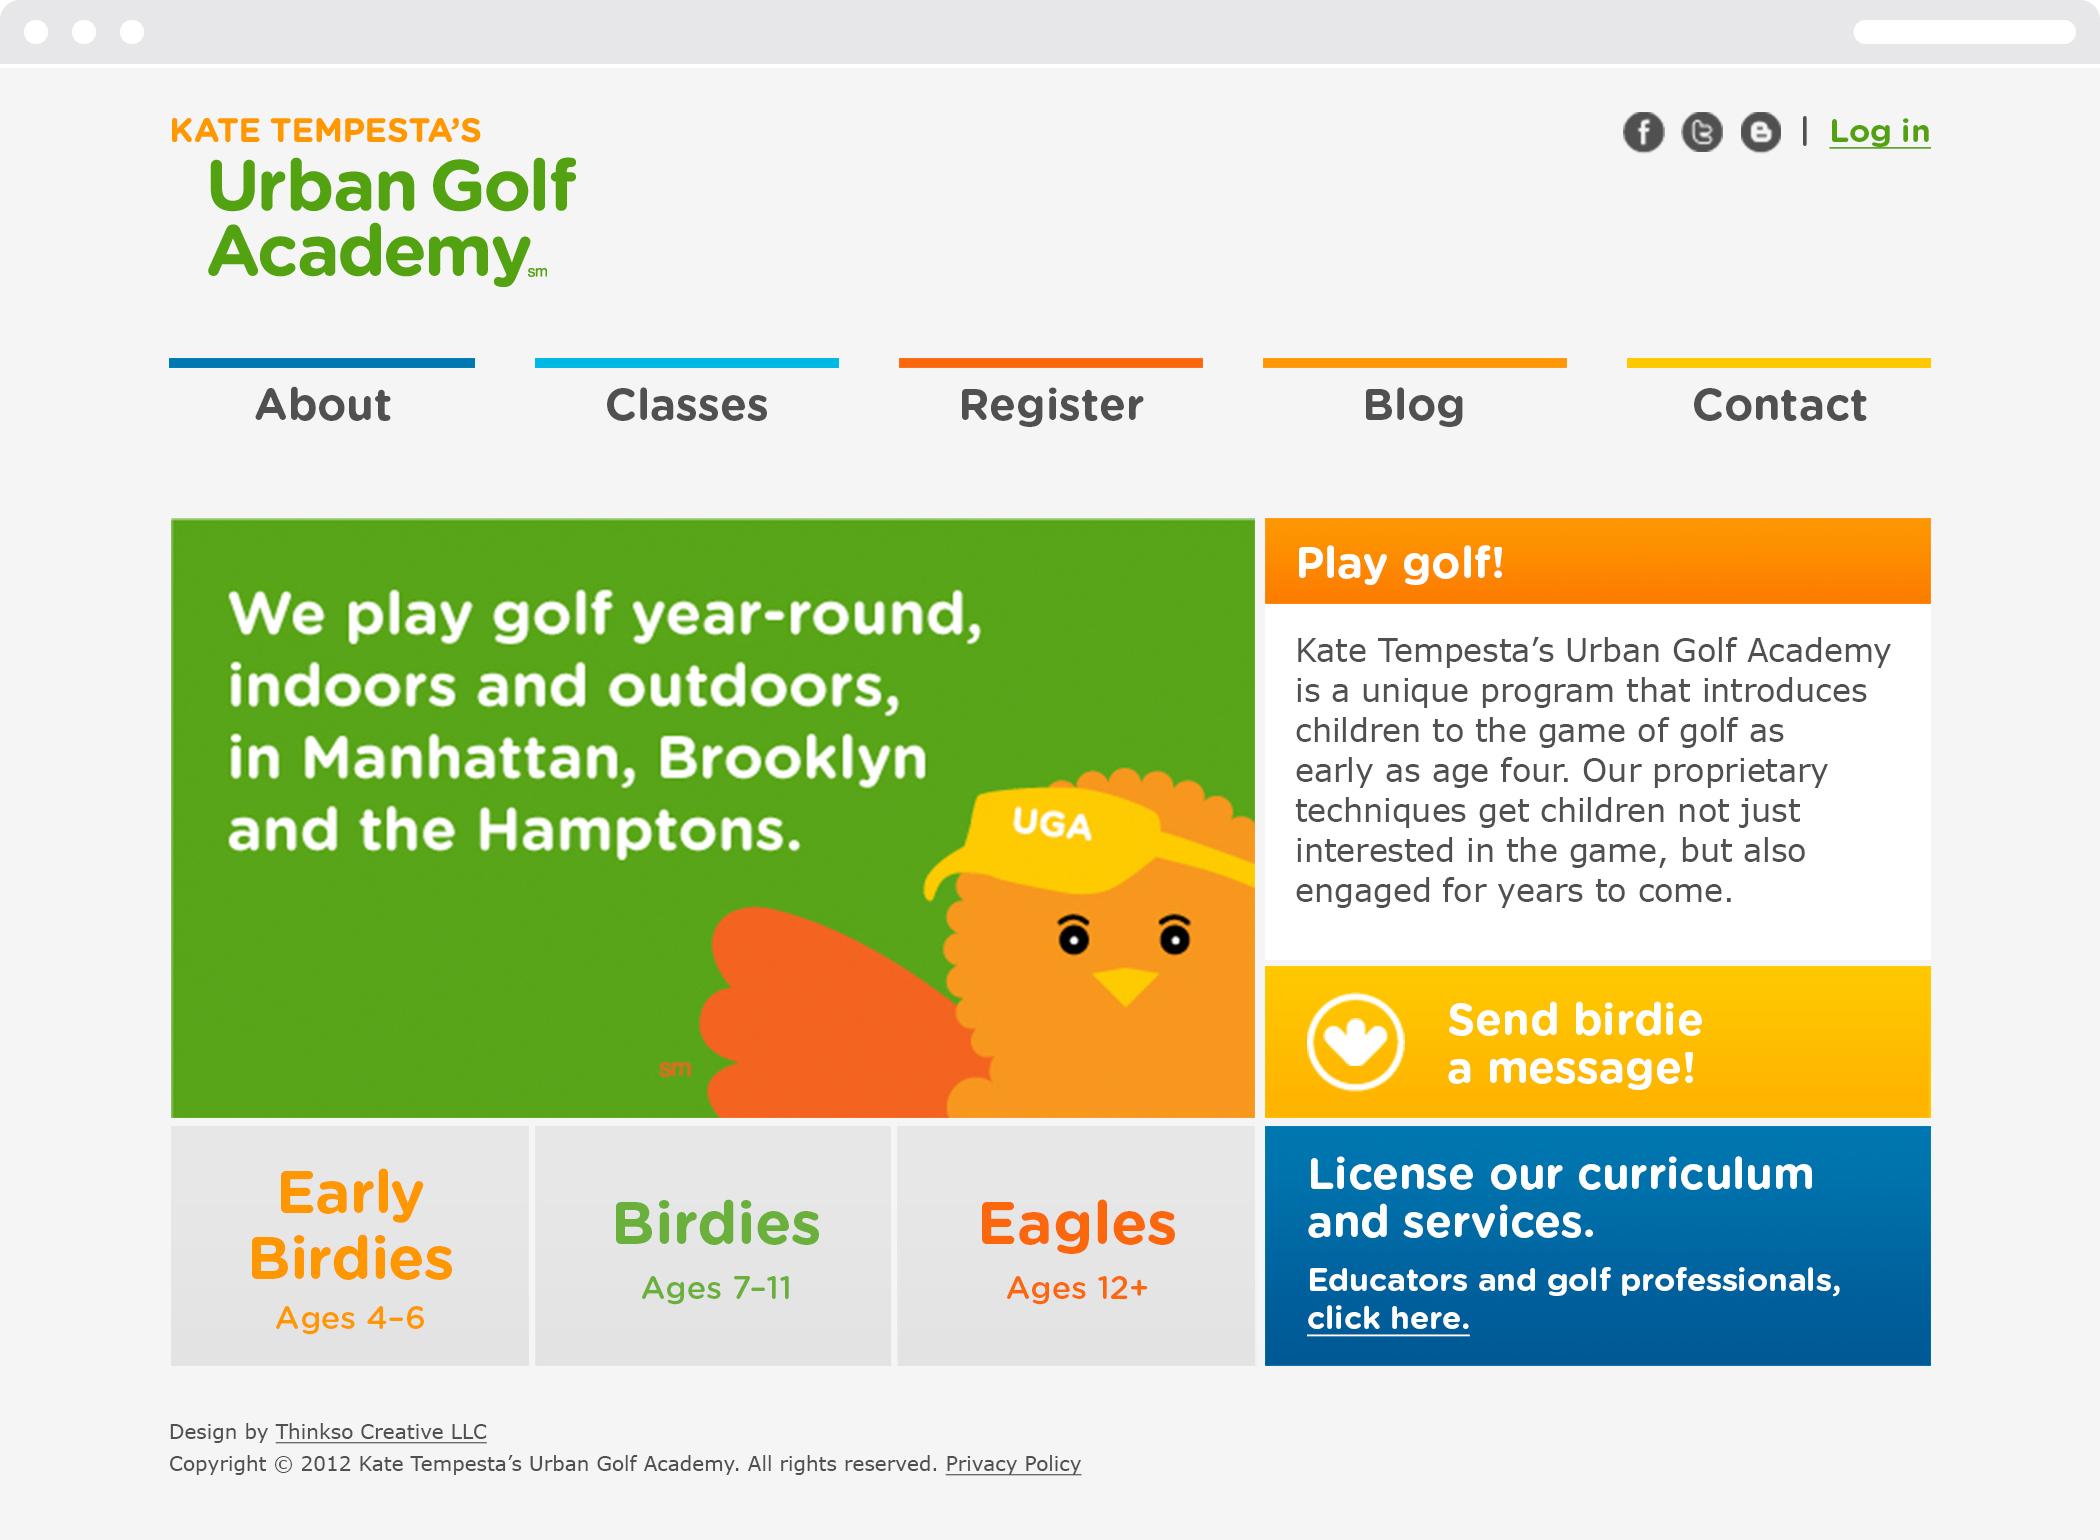 Kate Tempesta's Urban Golf Academy website homepage.